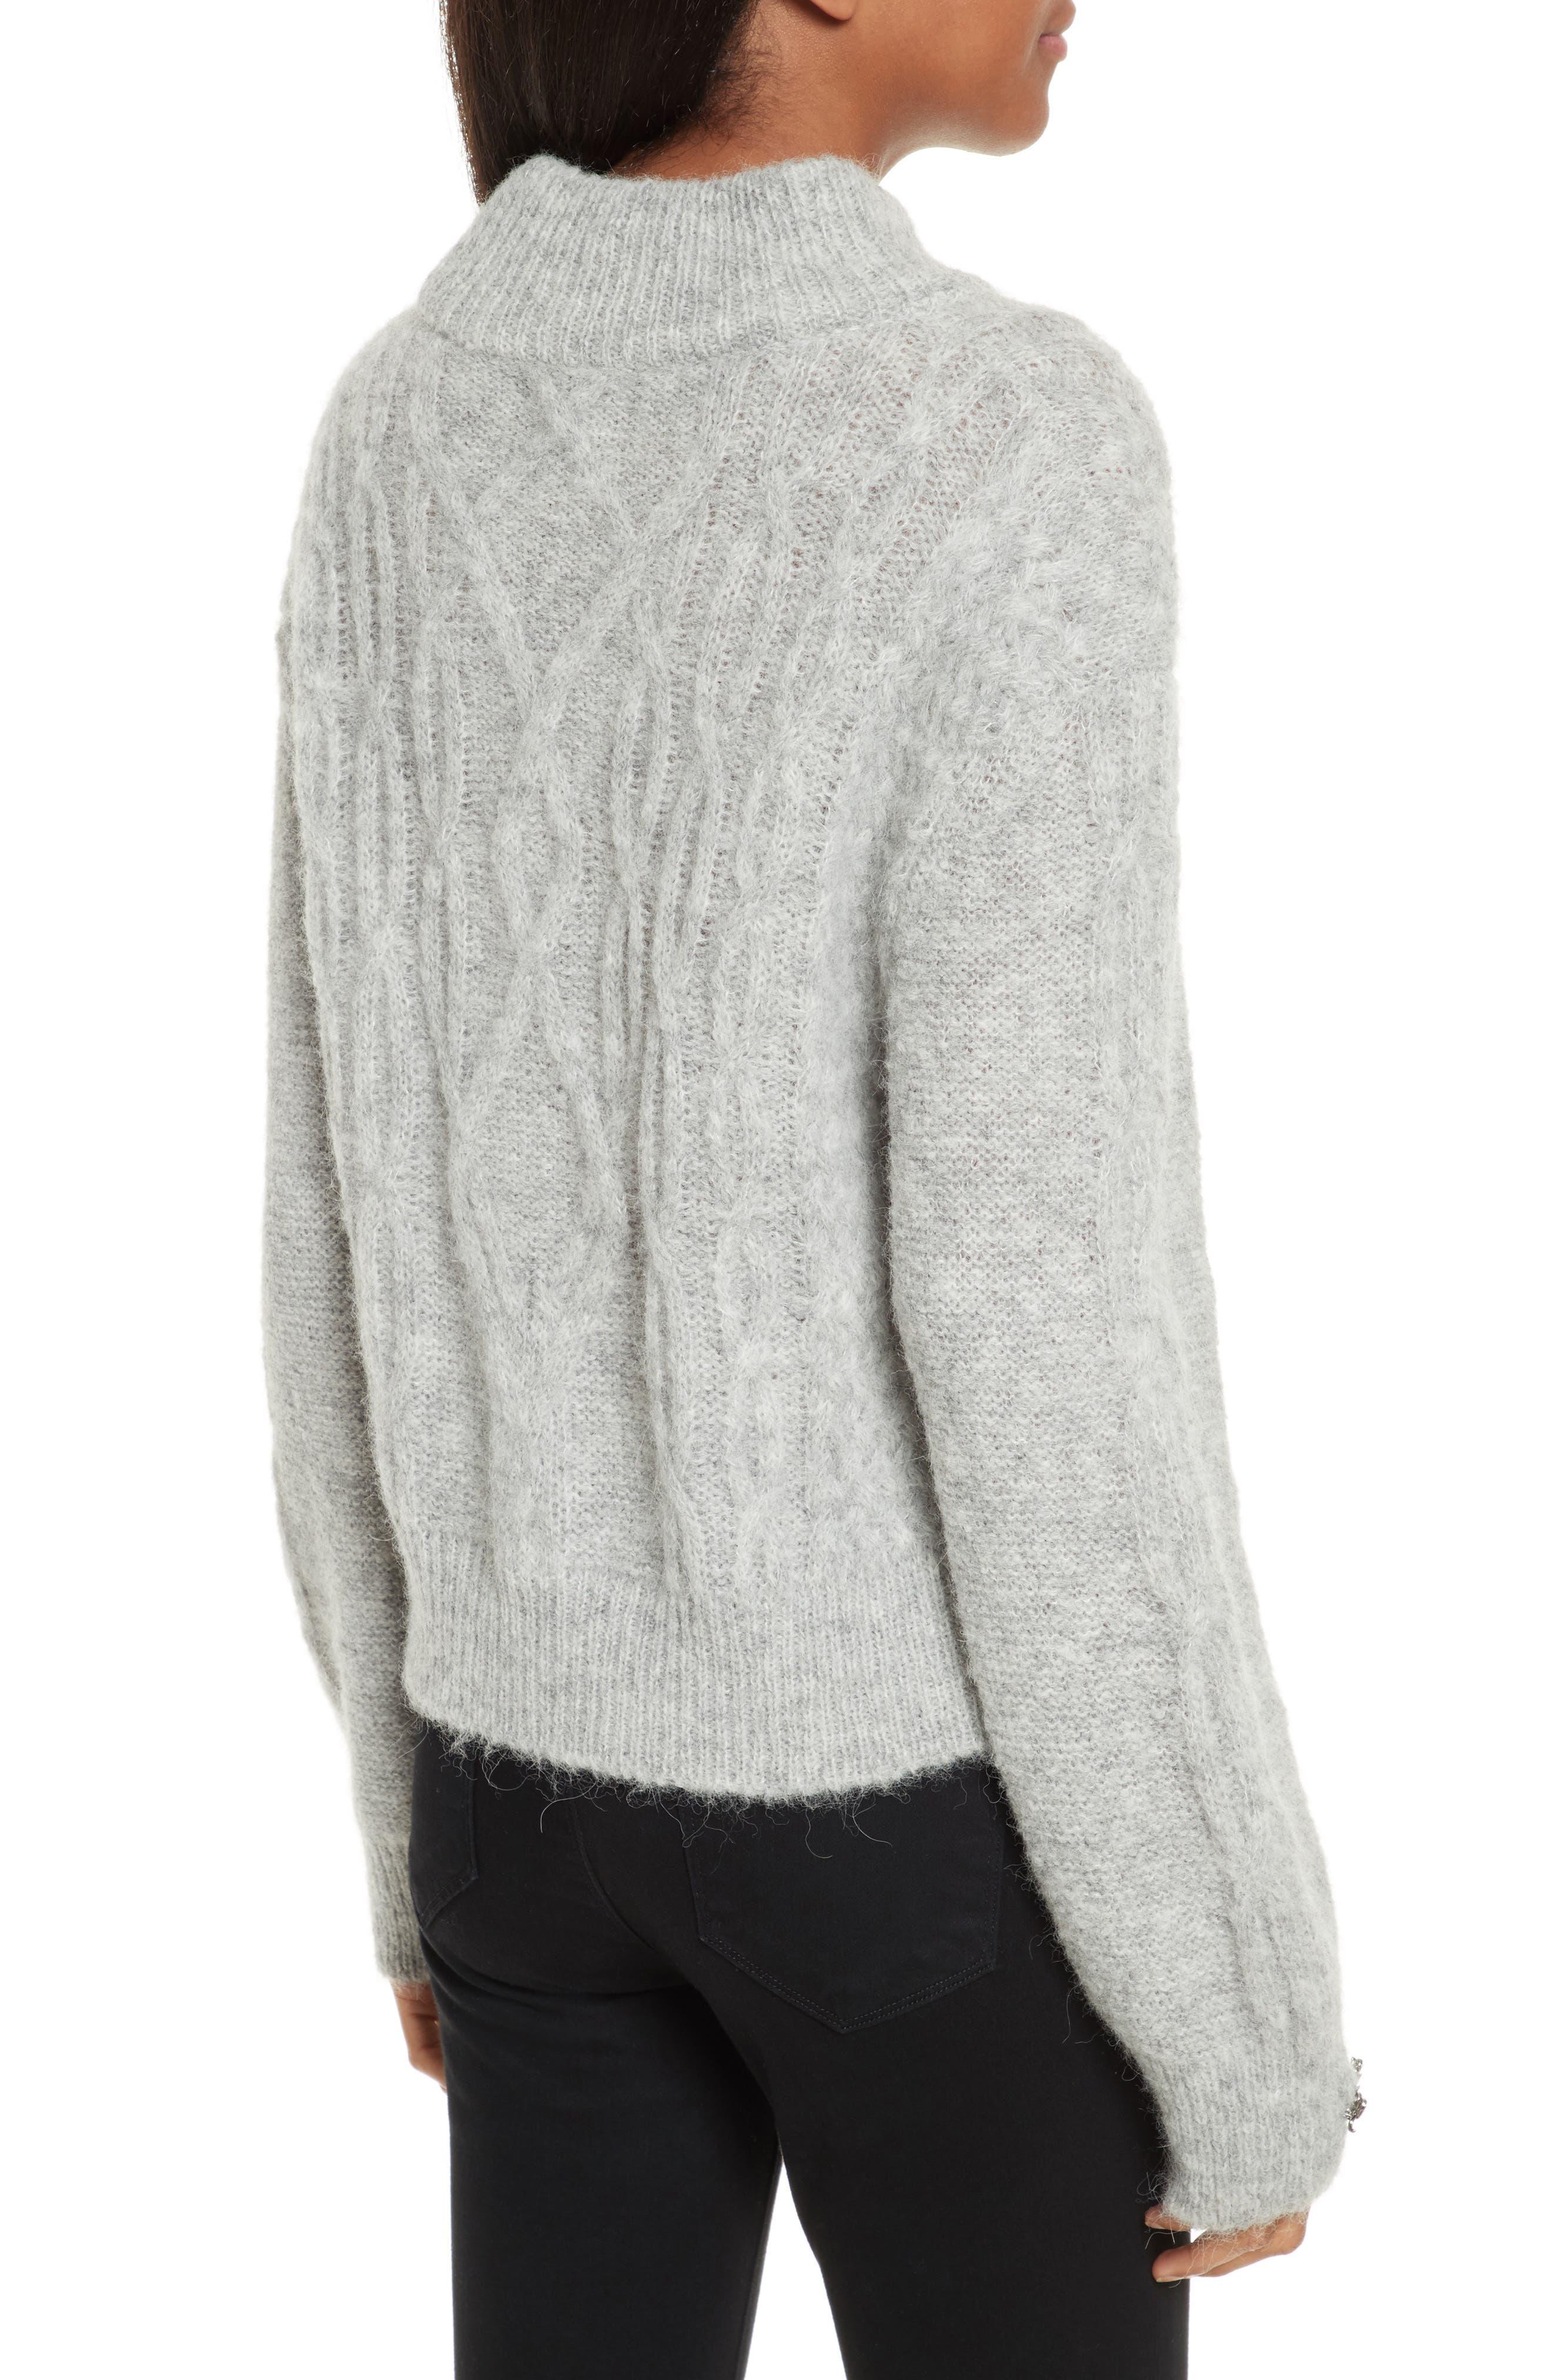 Garlan Mock Neck Sweater,                             Alternate thumbnail 2, color,                             051